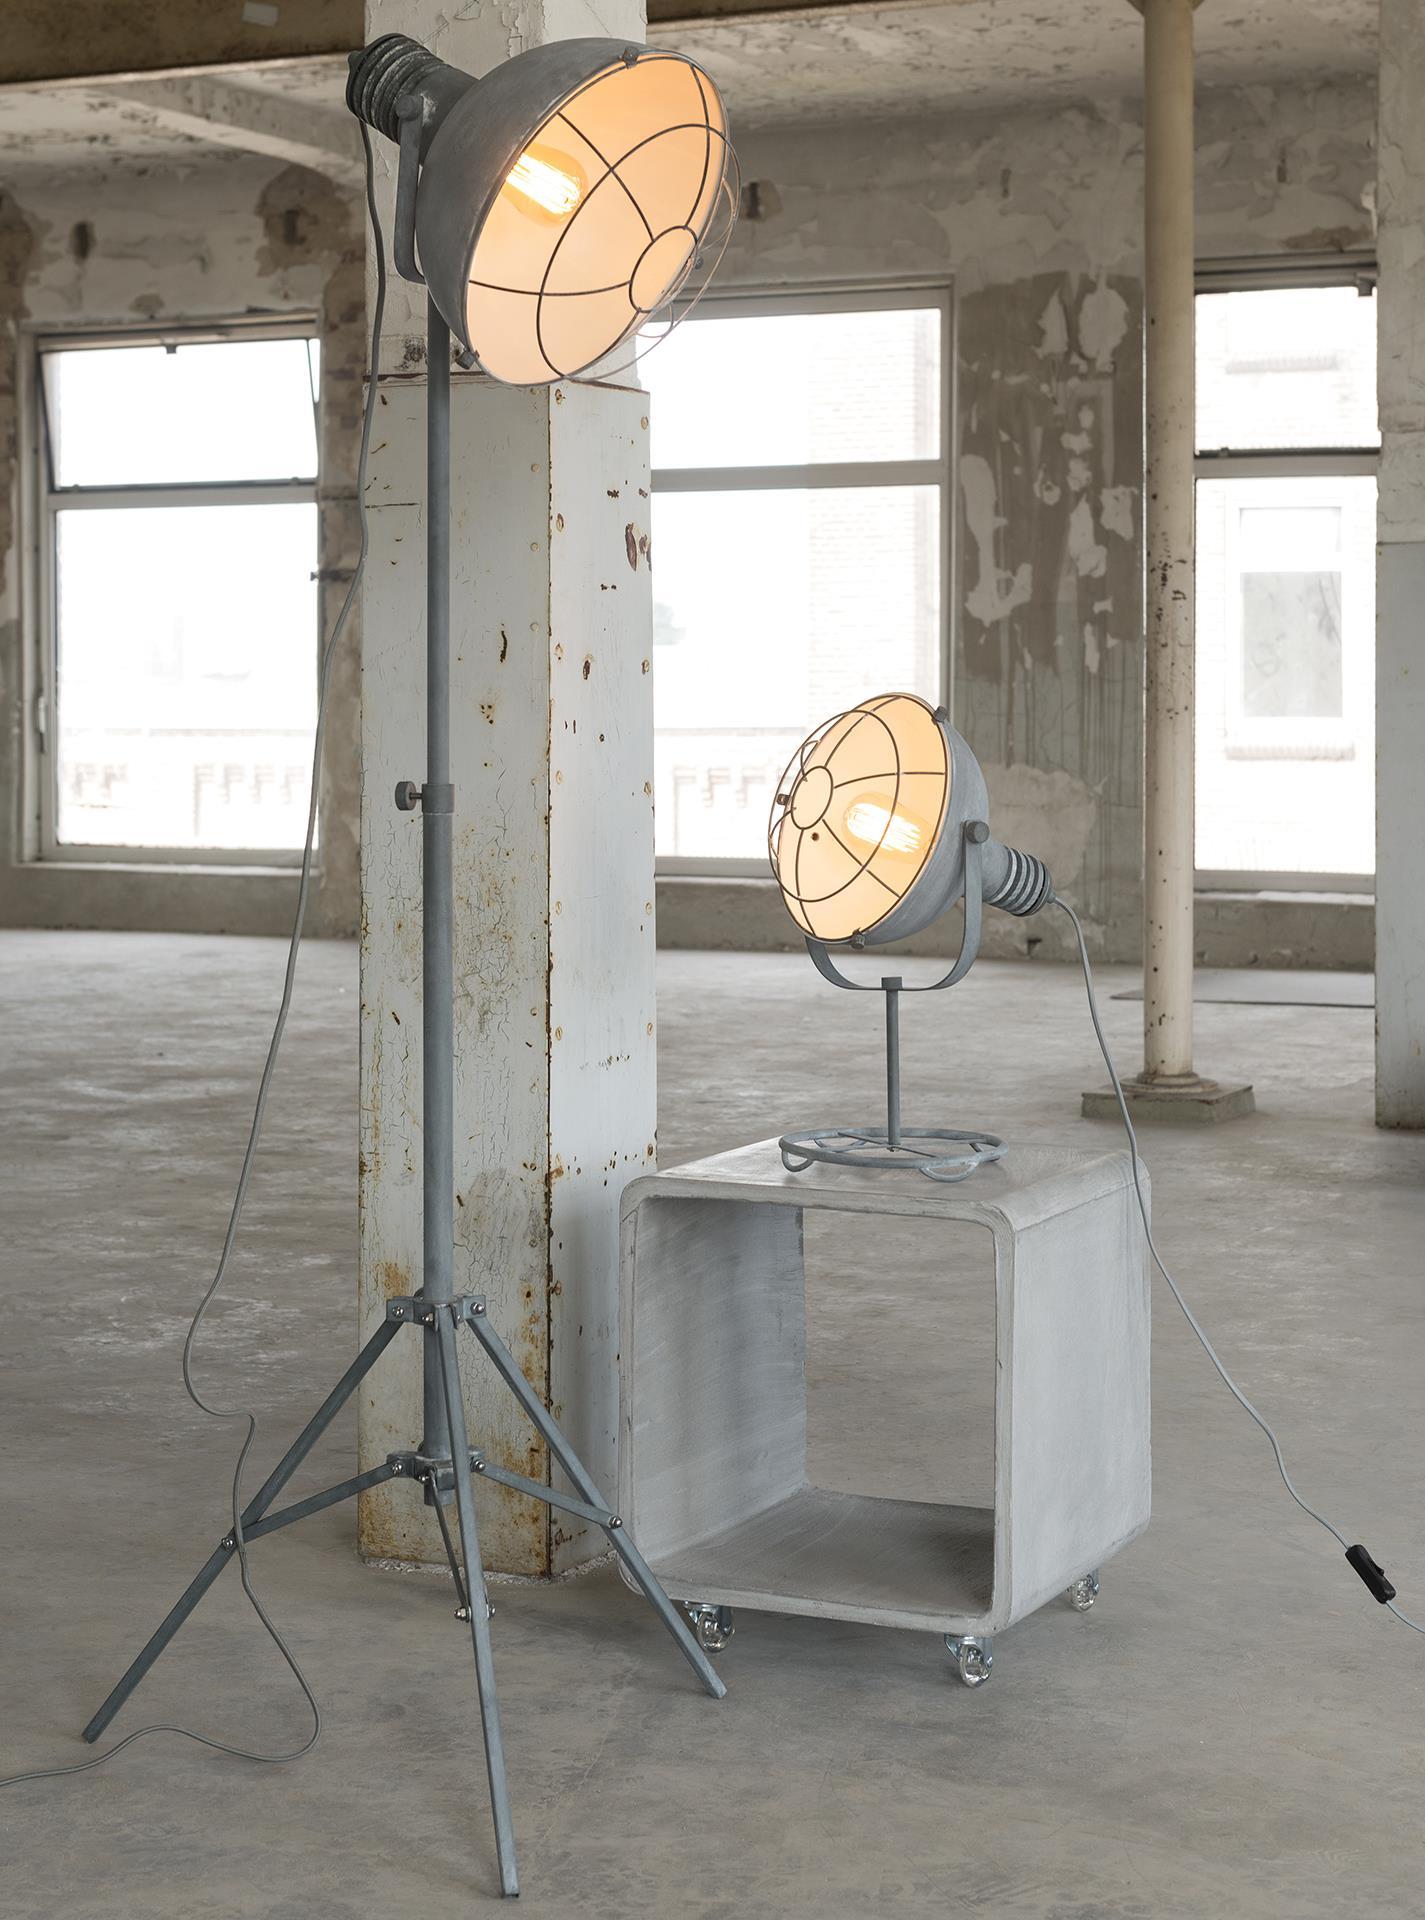 Industriële vloerlamp 'Trevon', driepoot in betonlook korting